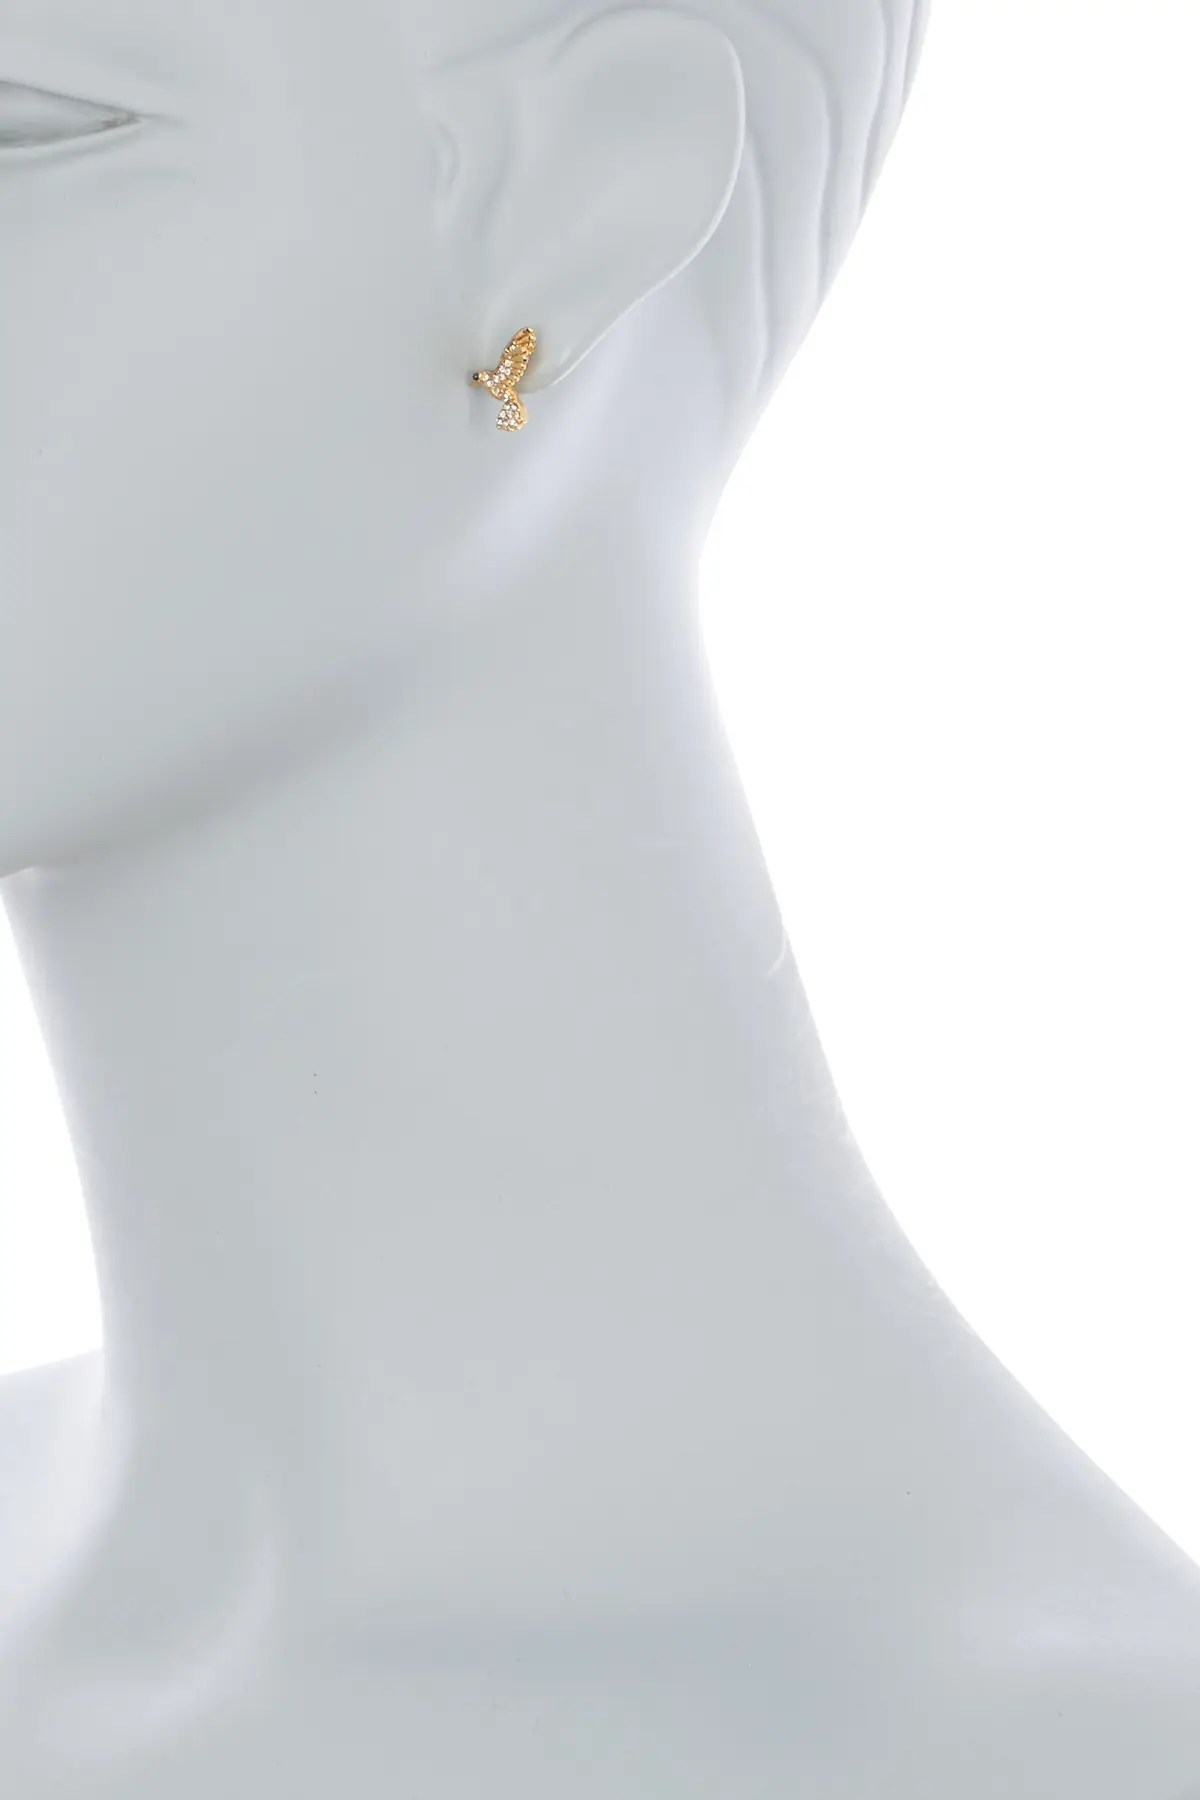 https www nordstromrack com brands kate 20spade 20new 20york women jewelry